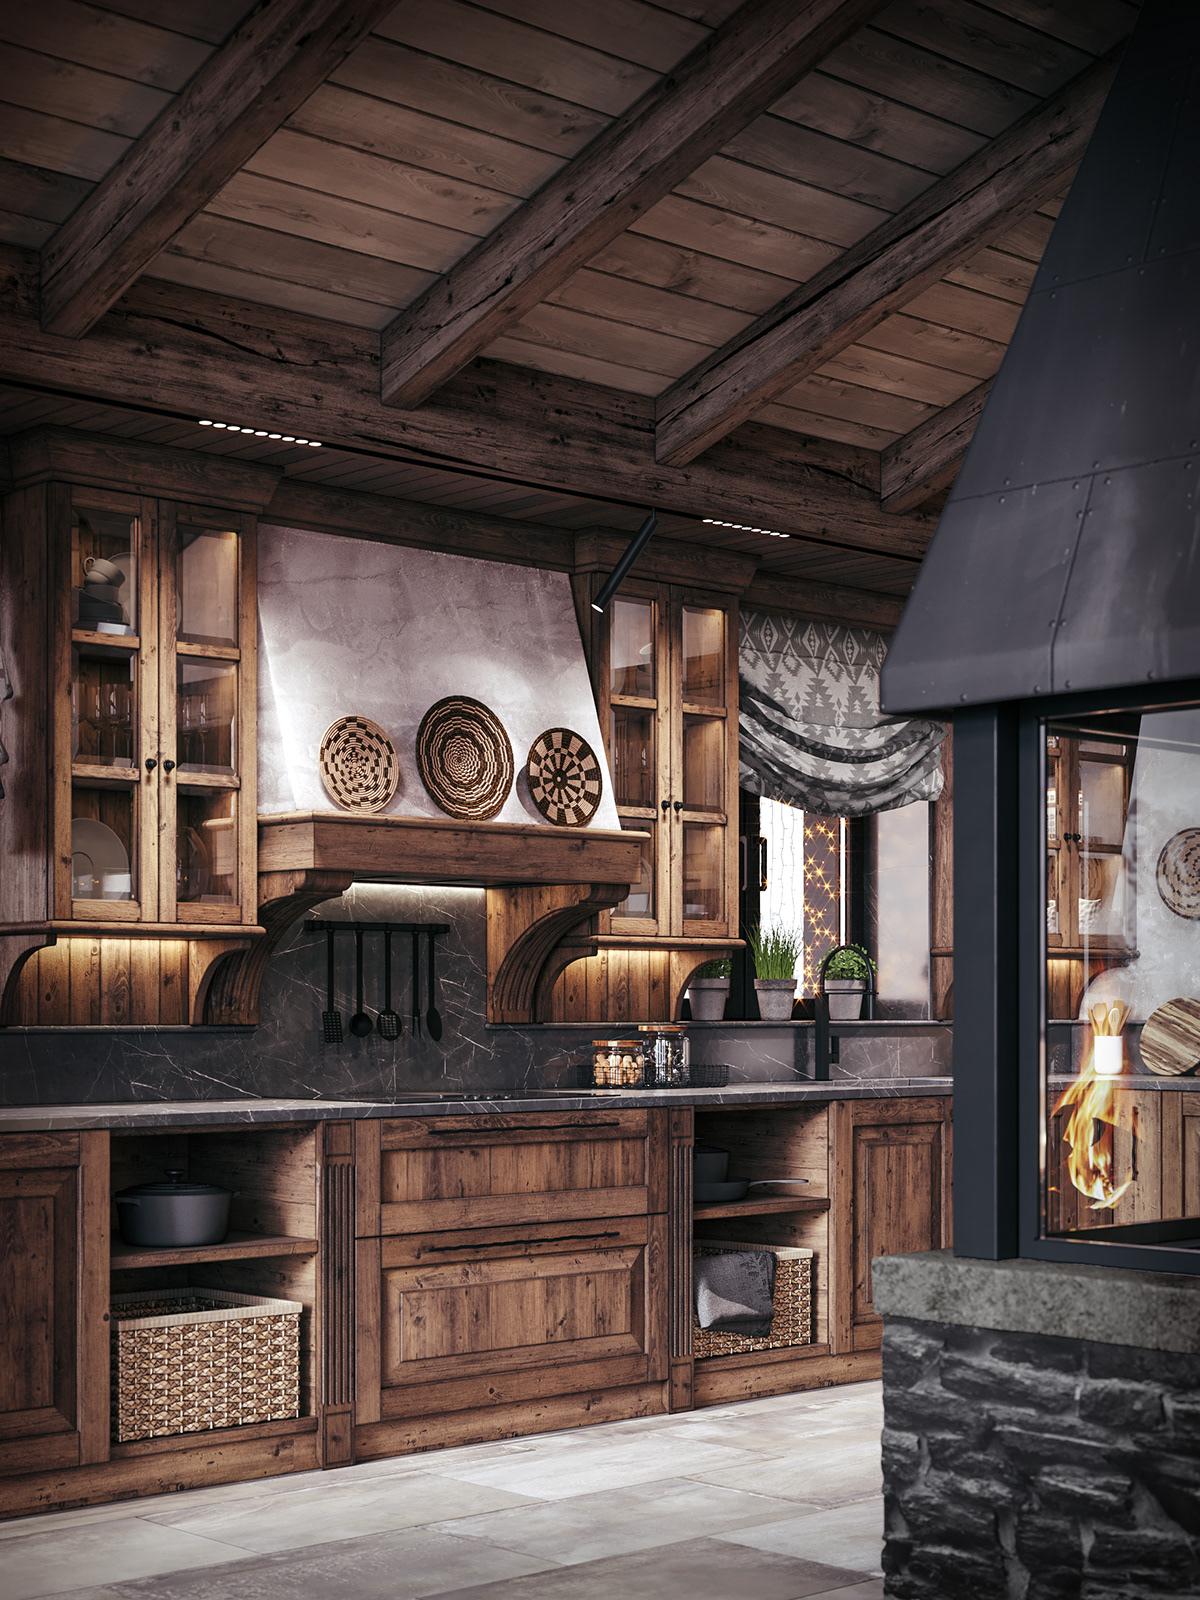 3D Visualization chalet dining room fireplace homedesign interior design  kiev kitchen rustic Switzerland